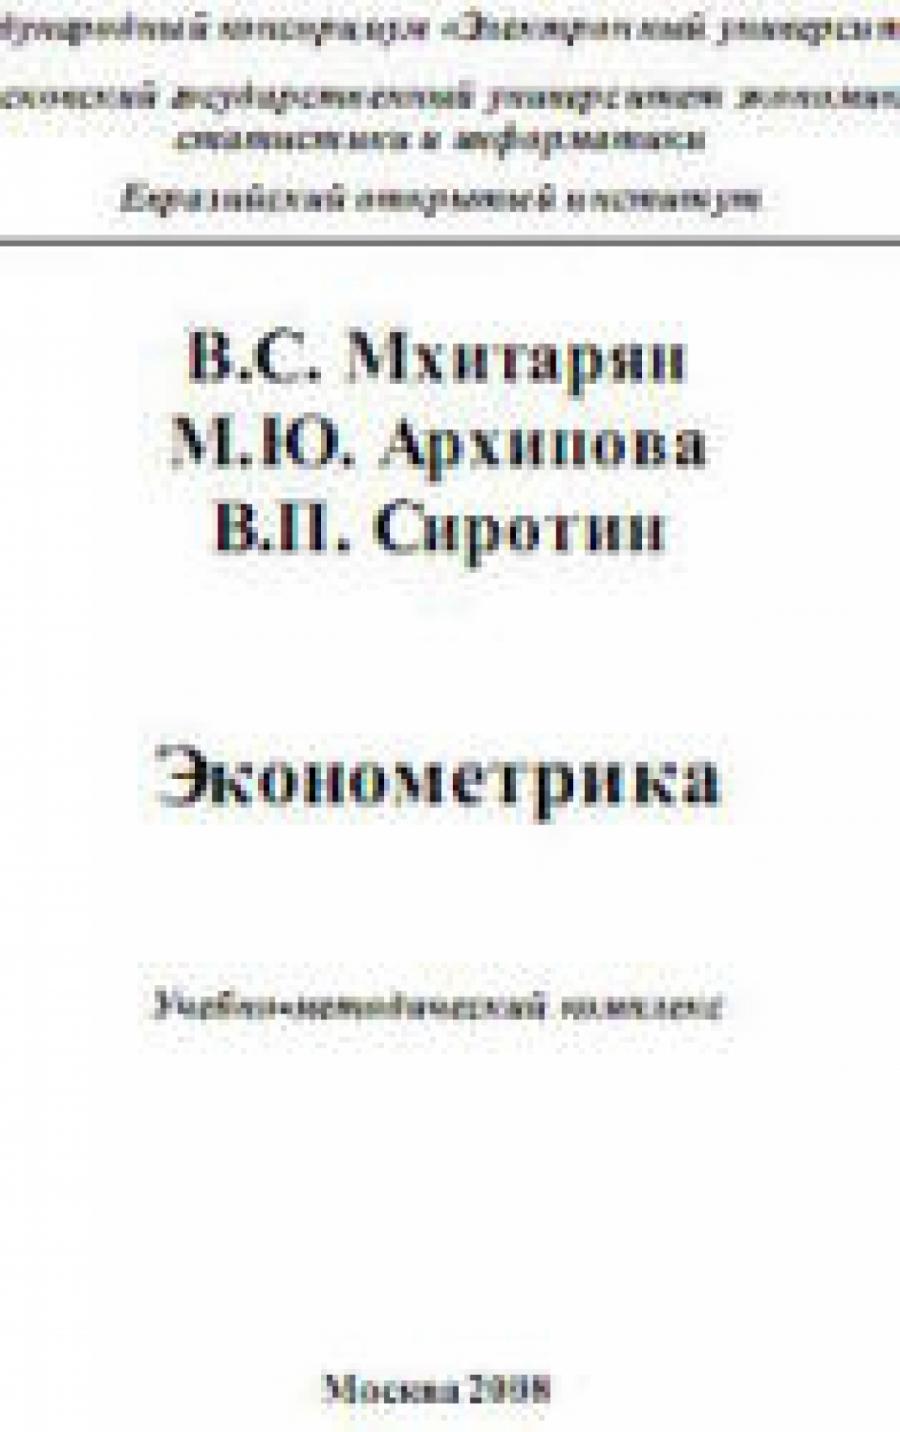 Обложка книги:  в.с. мхитарян,м.ю. архипова,в.п. сиротин - эконометрика